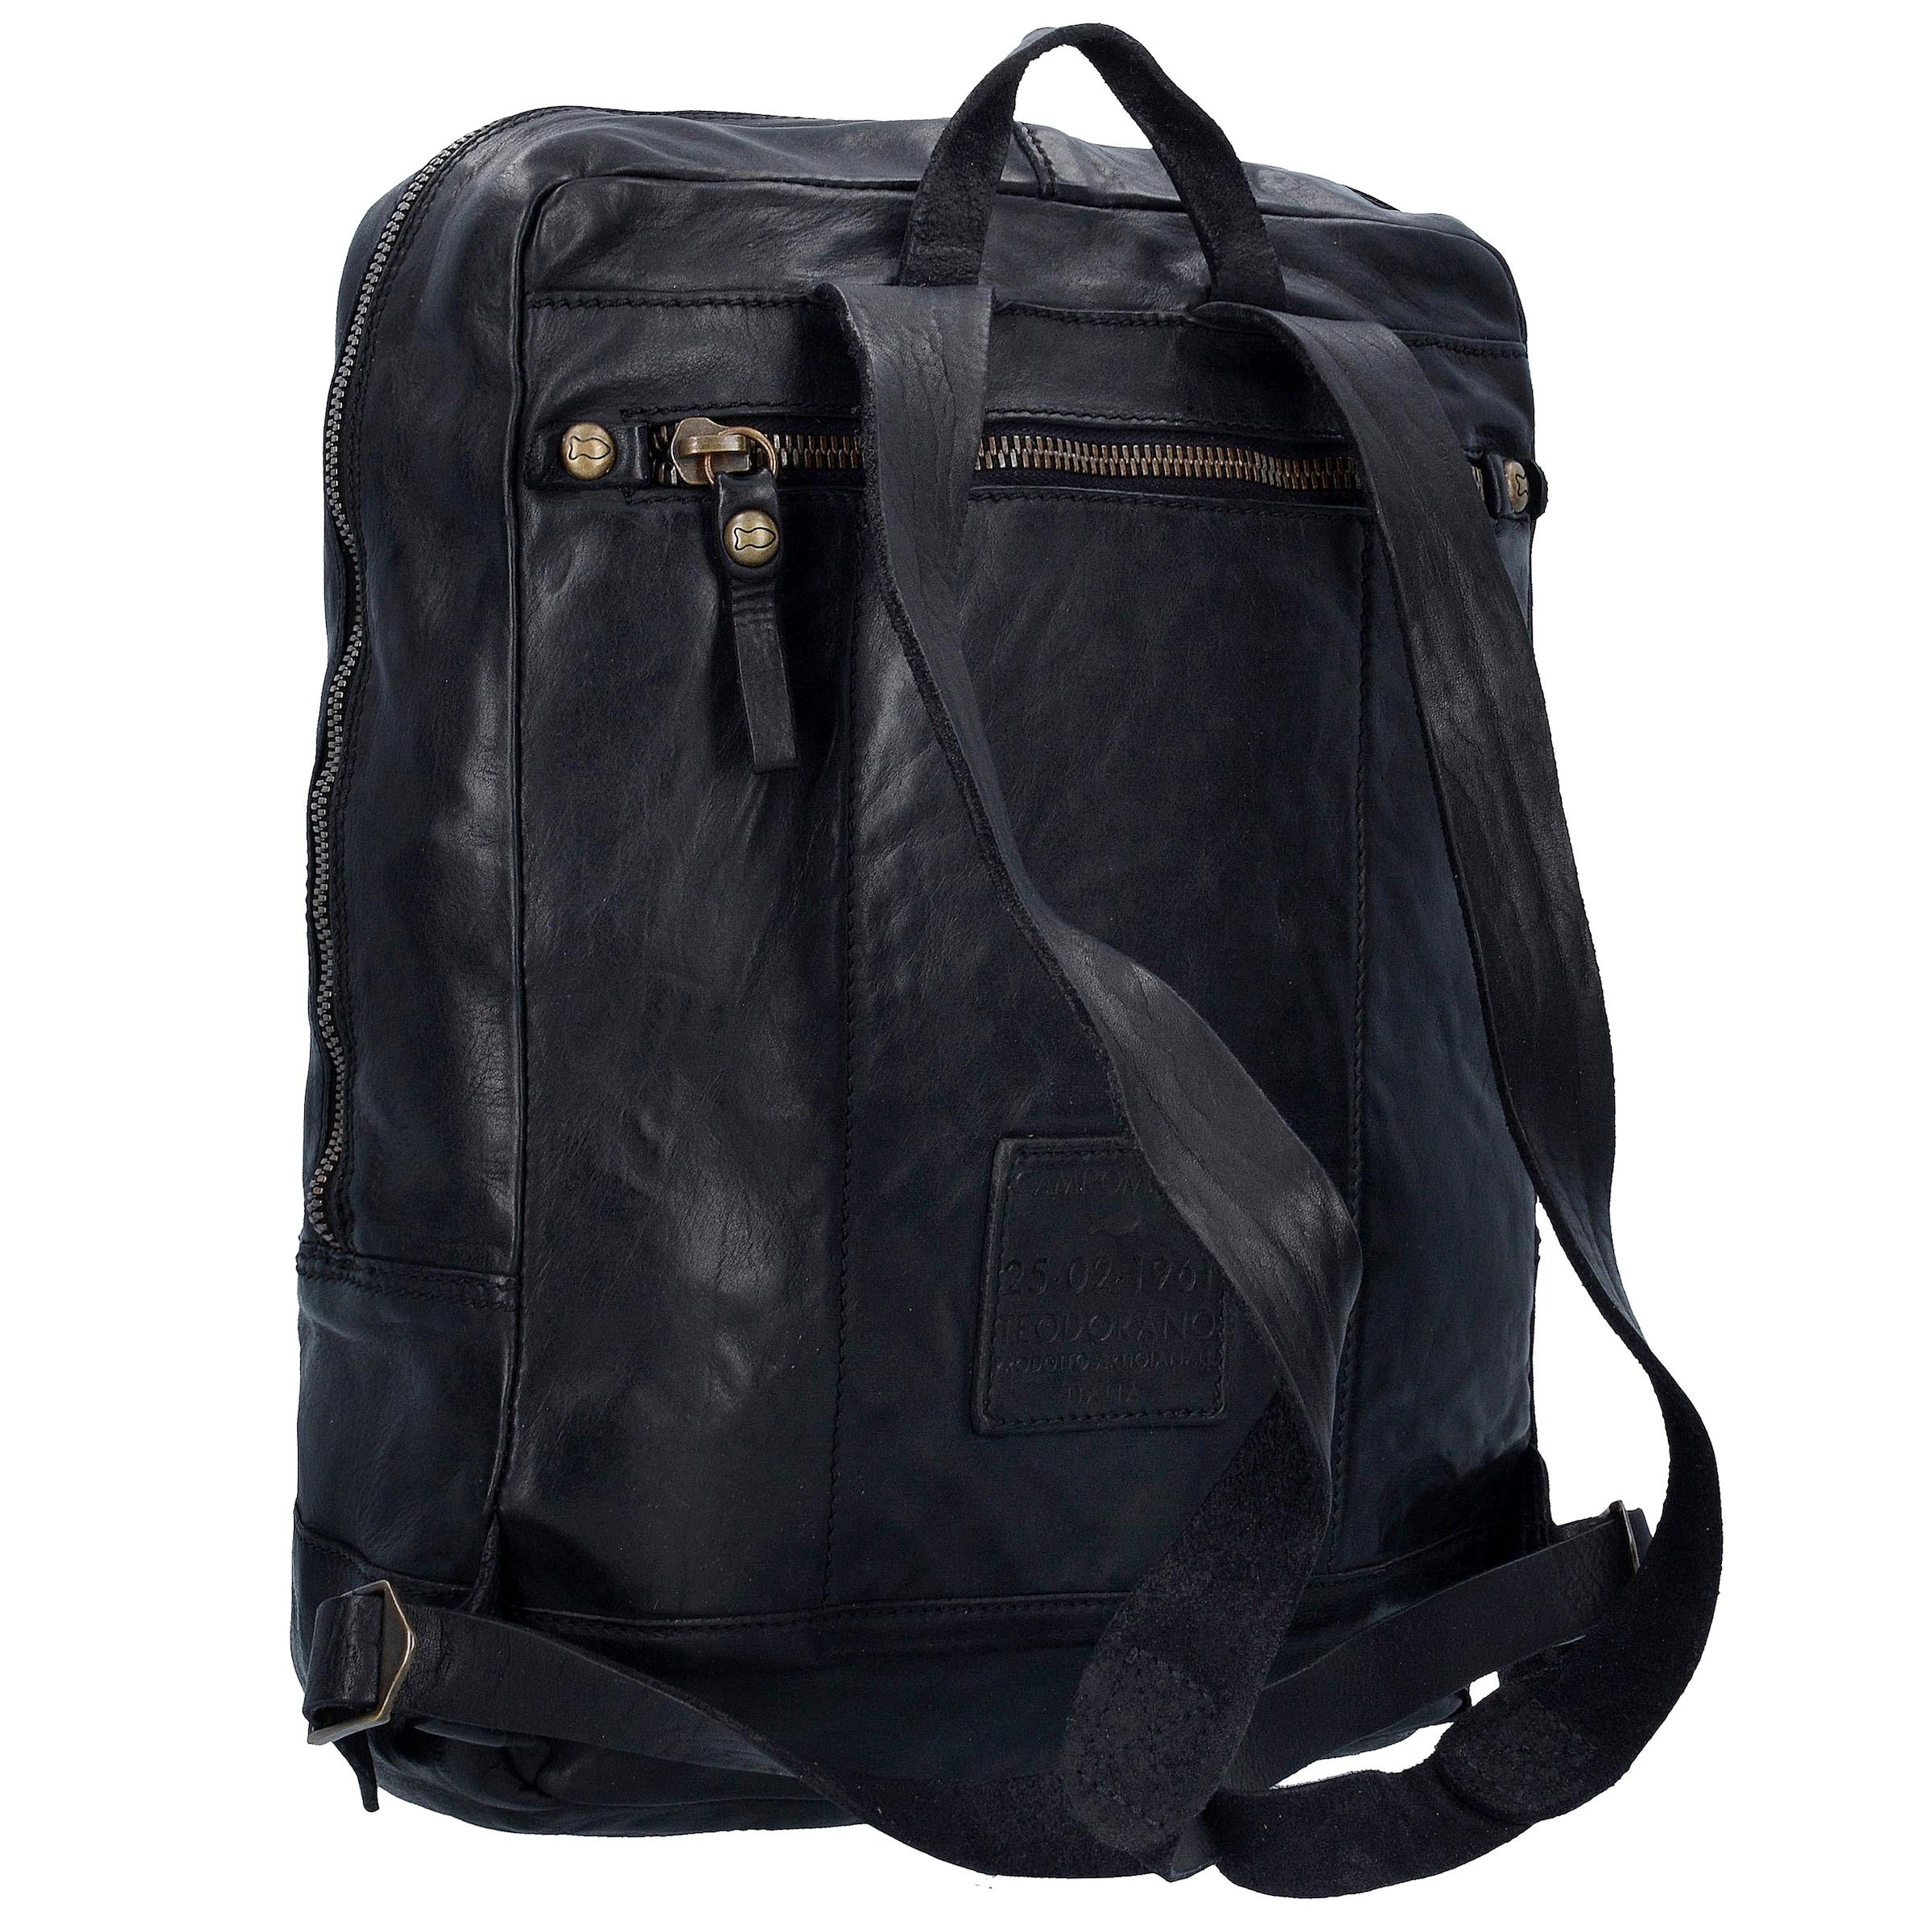 Rabatt Mode-Stil Finish Online Campomaggi Traditional City Rucksack aus Leder 35 cm Rabatt Wirklich Manchester Günstig Online JvCmRPEvQ